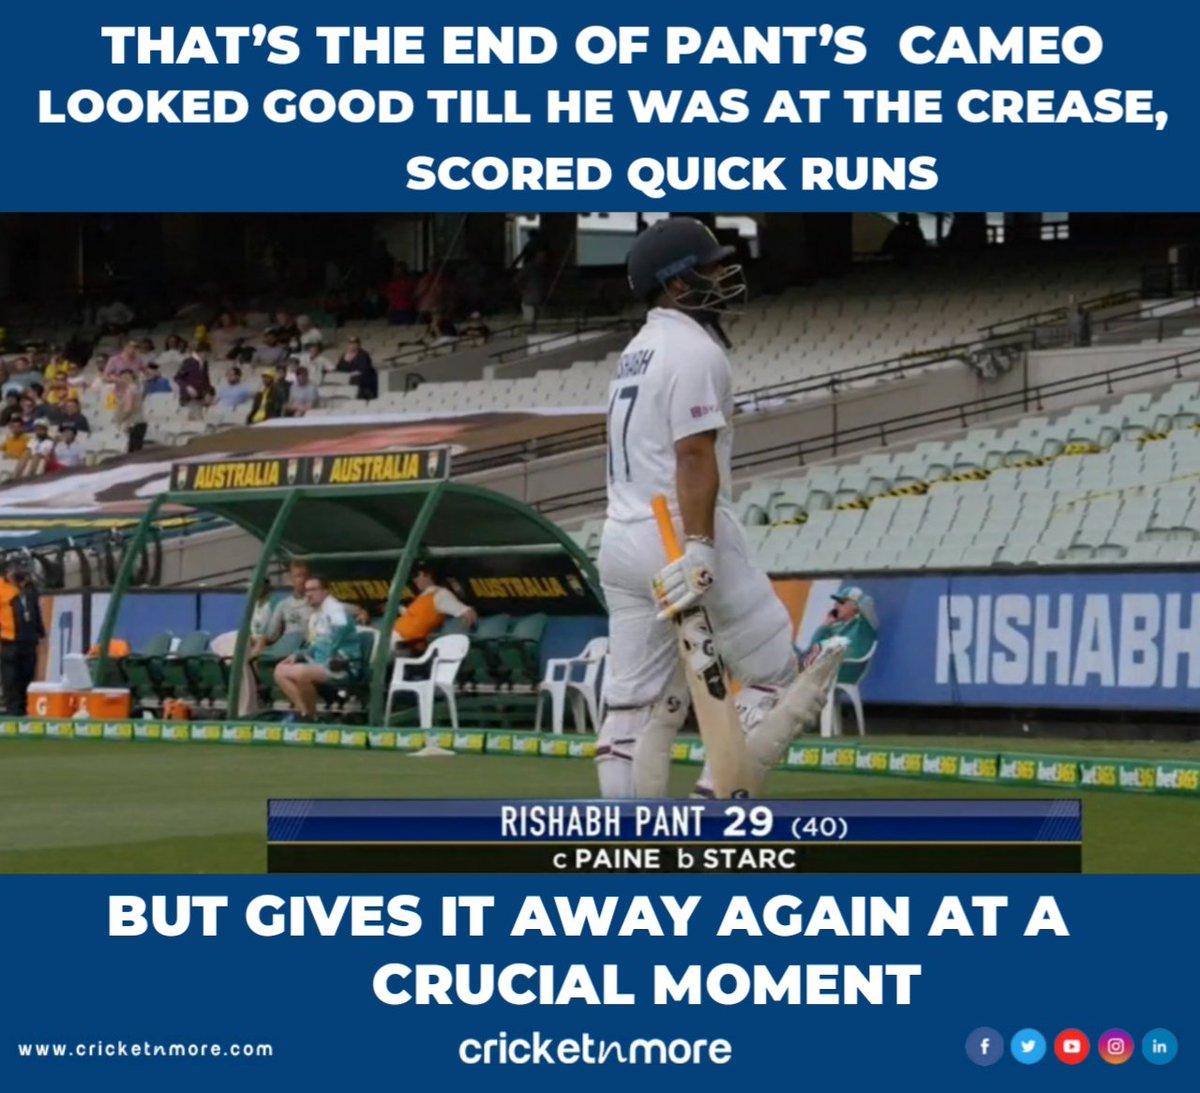 Rishabh Pant . . #IndianCricket #TeamIndia #Aussie #AustraliaCricket #AUSvIND #NZVWI #SAvENG